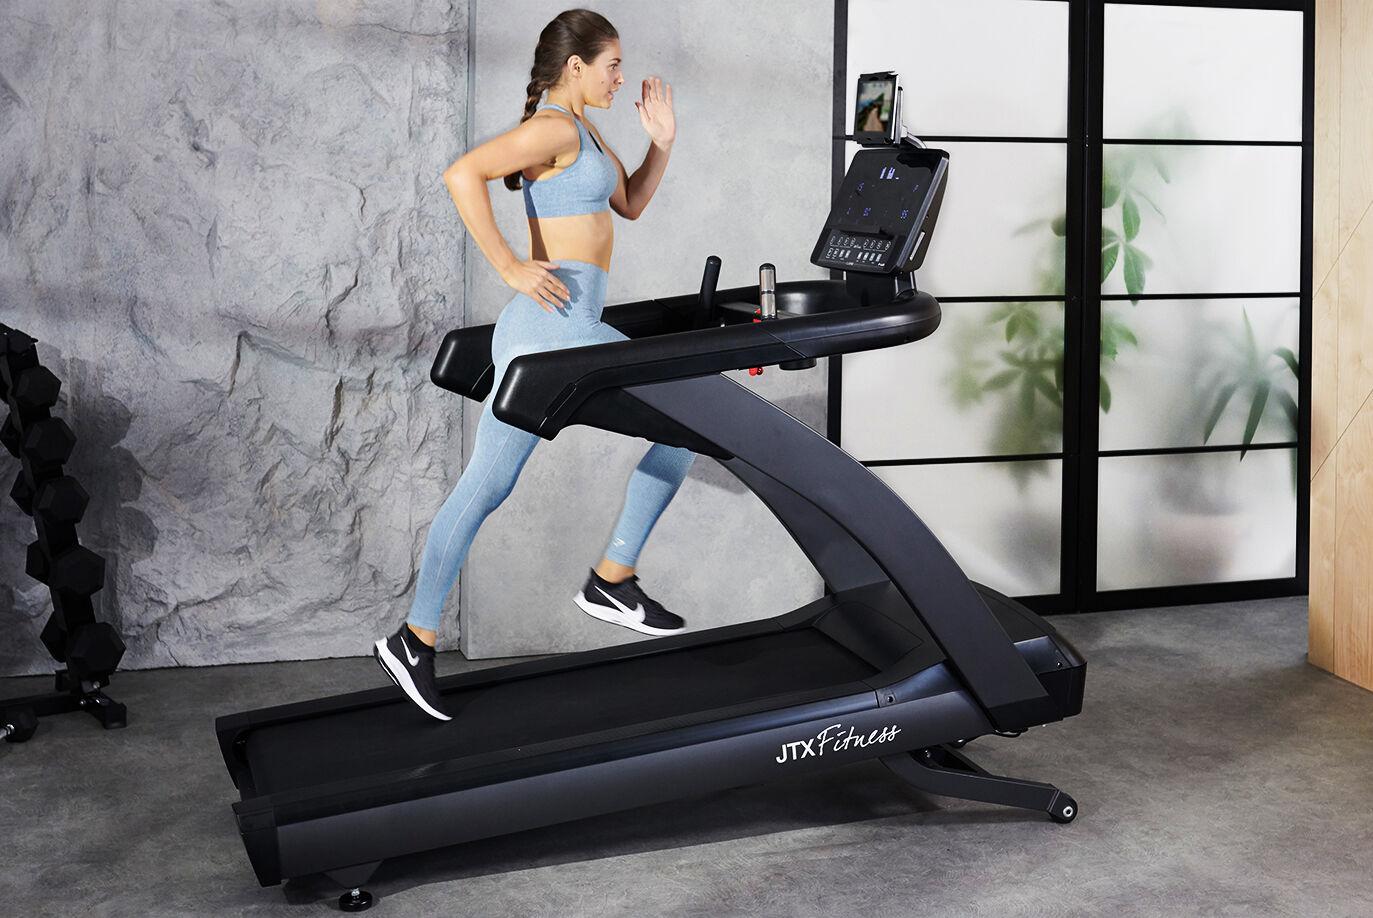 JTX Club Pro Semi Commercial Treadmill